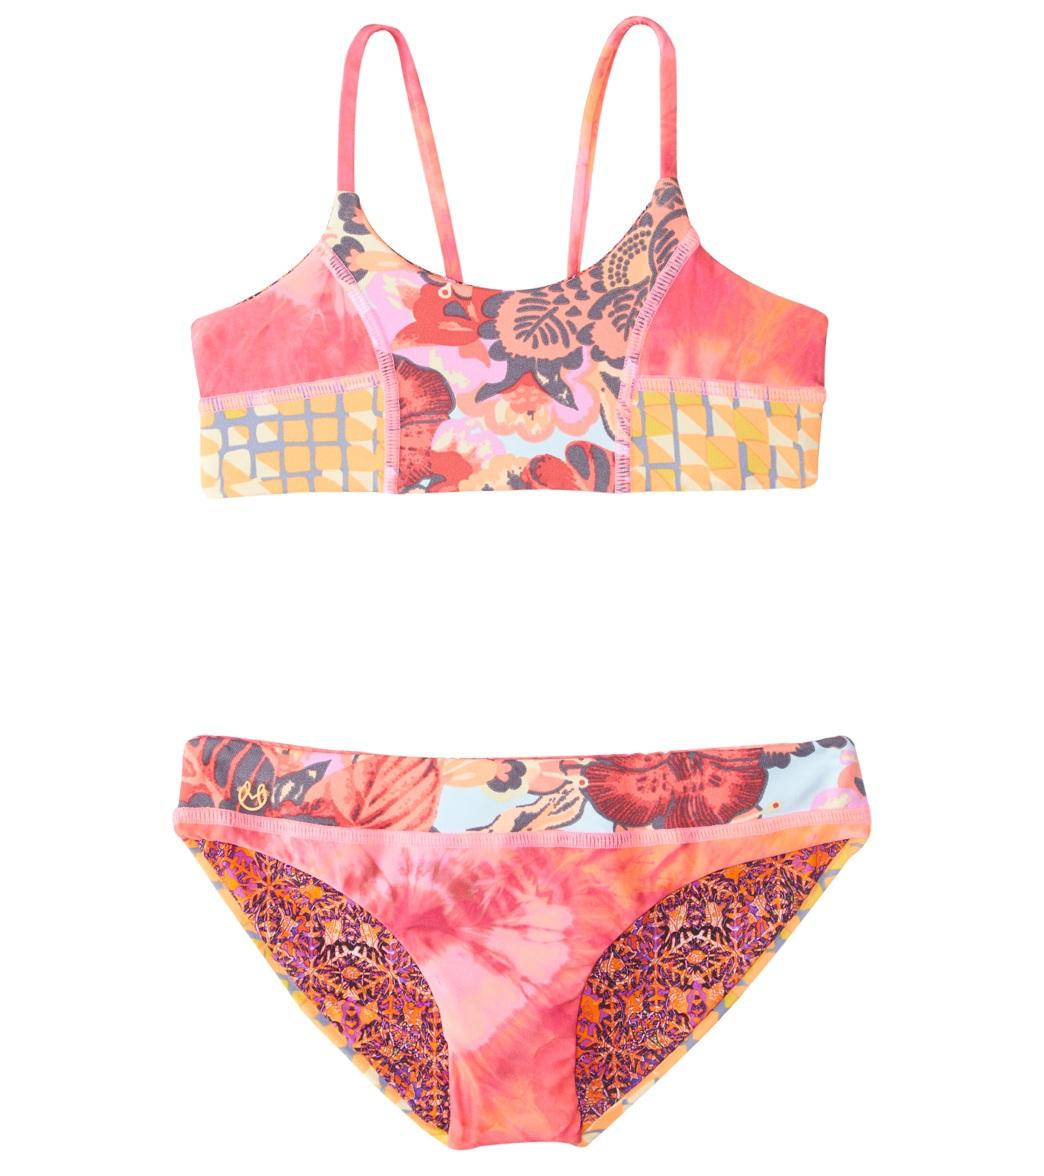 Maaji Girls  Lemonade Bikini Set (2-16) at SwimOutlet.com - Free Shipping 85c7fc22c52c